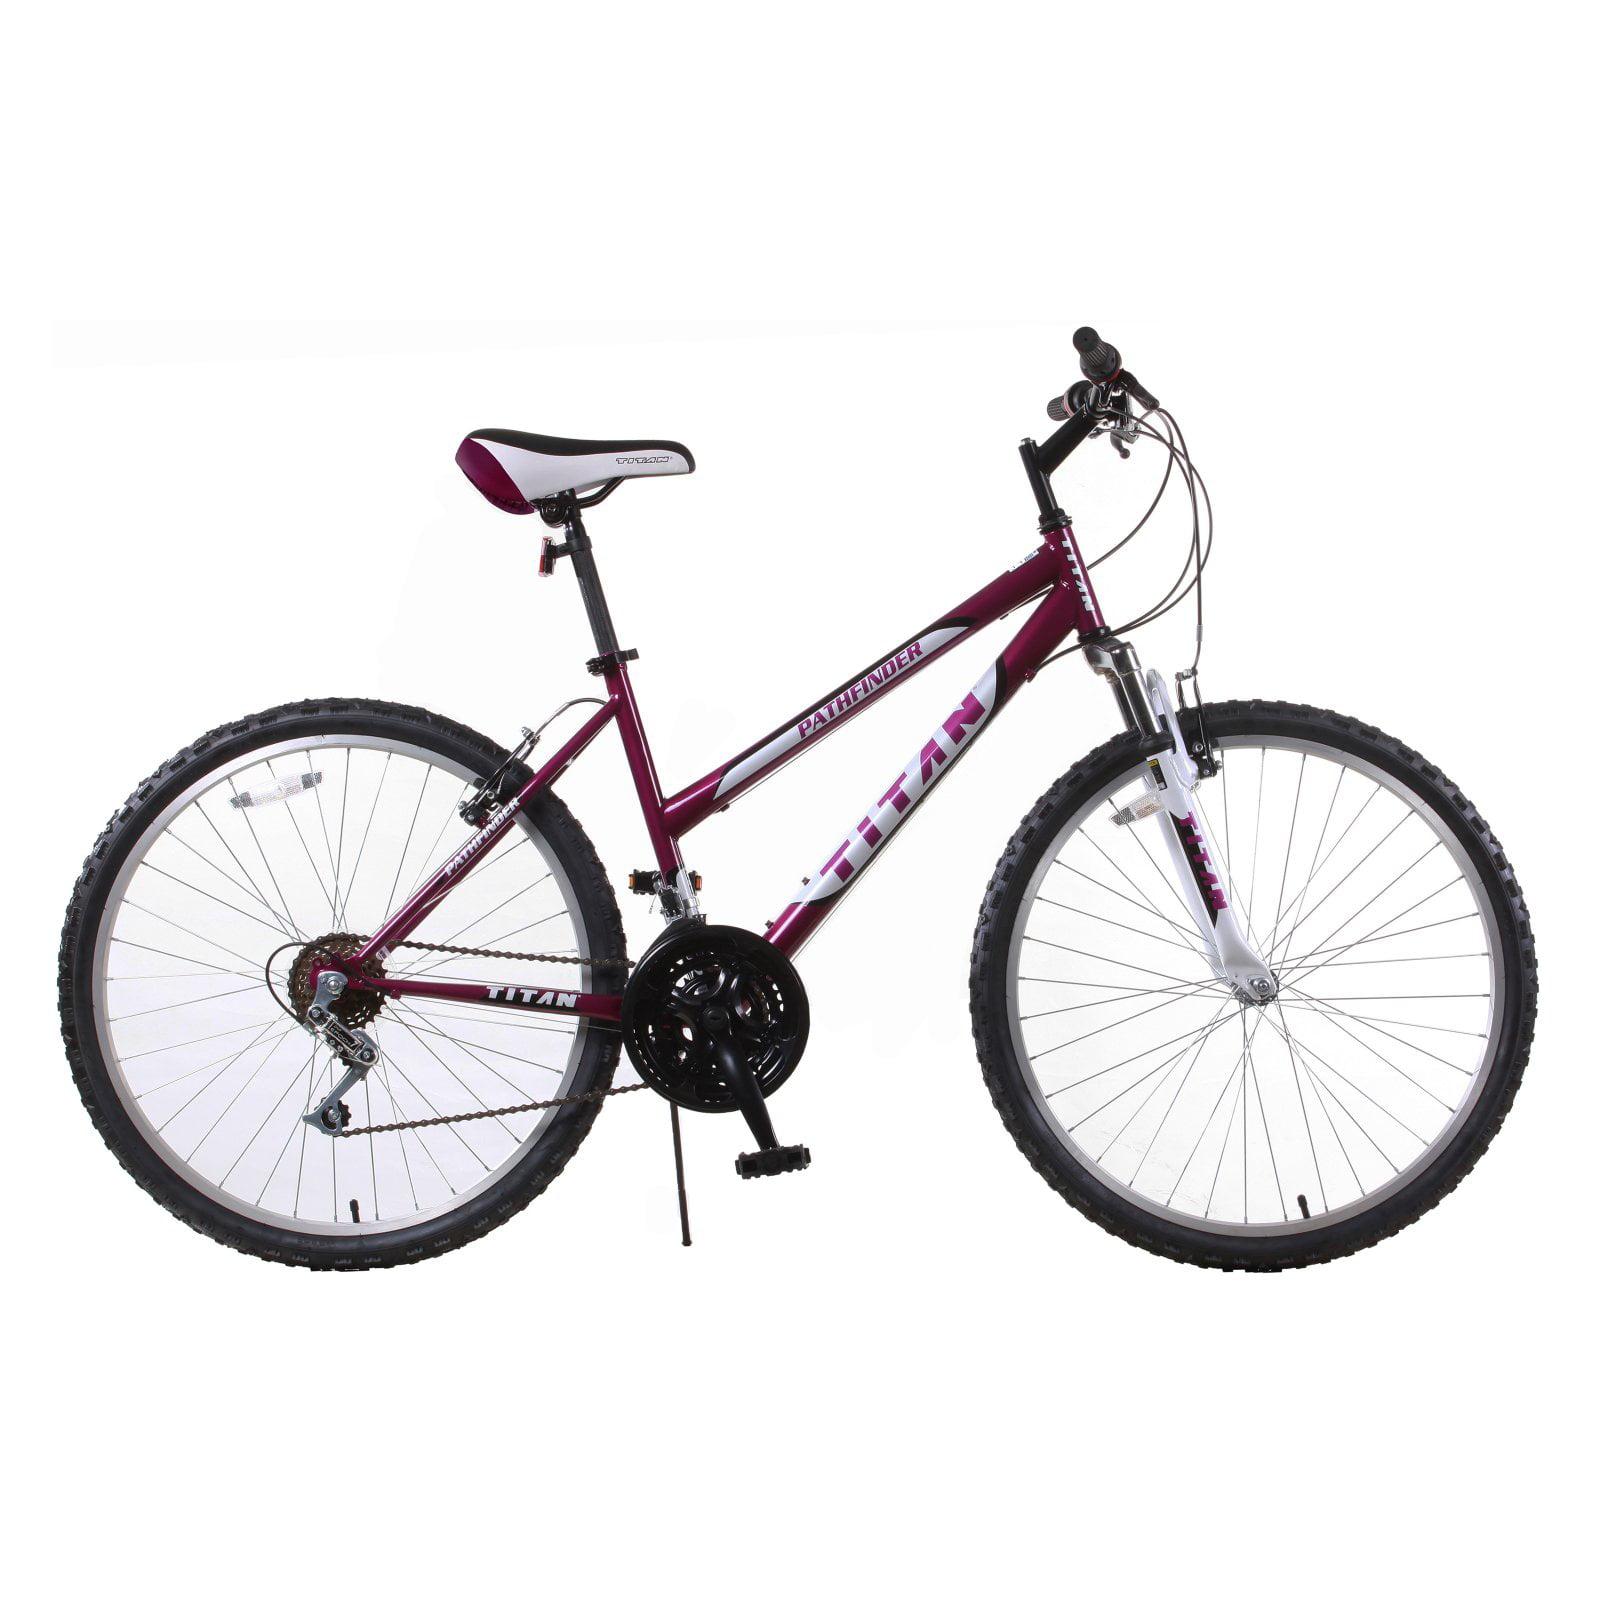 Titan Pathfinder Women's 18-Speed Mountain Bike, Purple